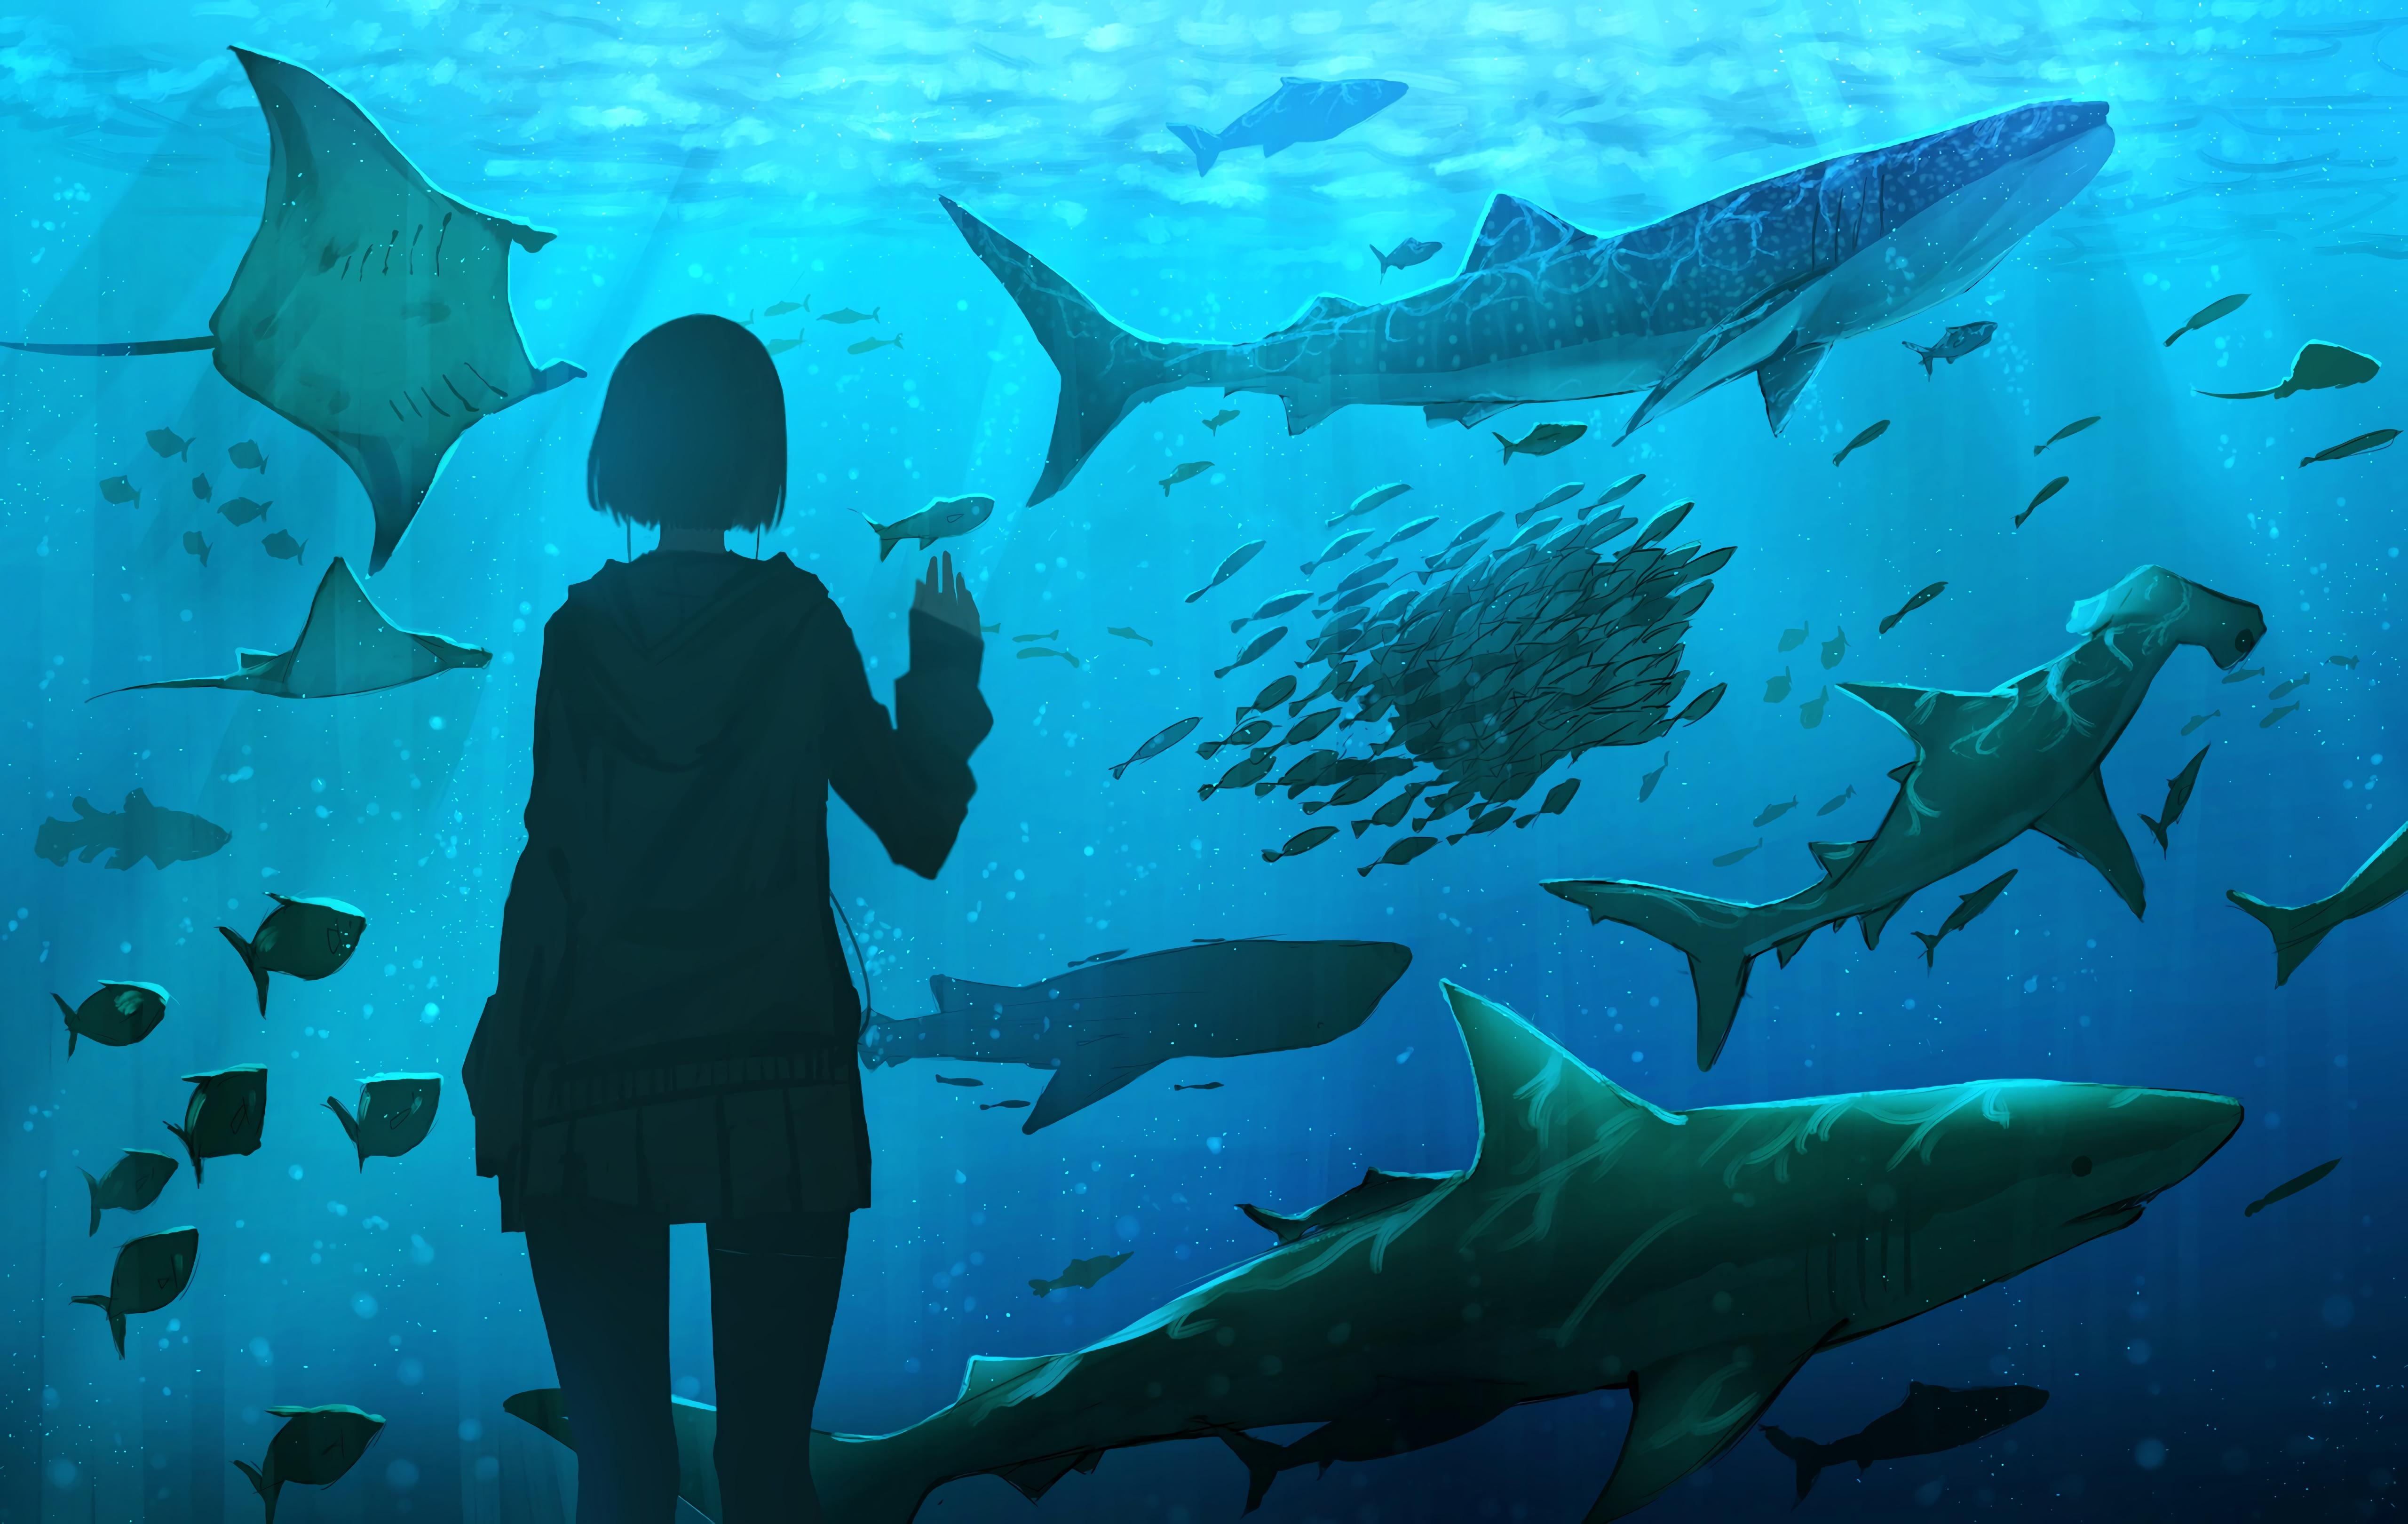 157088 Screensavers and Wallpapers Aquarium for phone. Download Art, Girl, Underwater World, Aquarium, Fish pictures for free